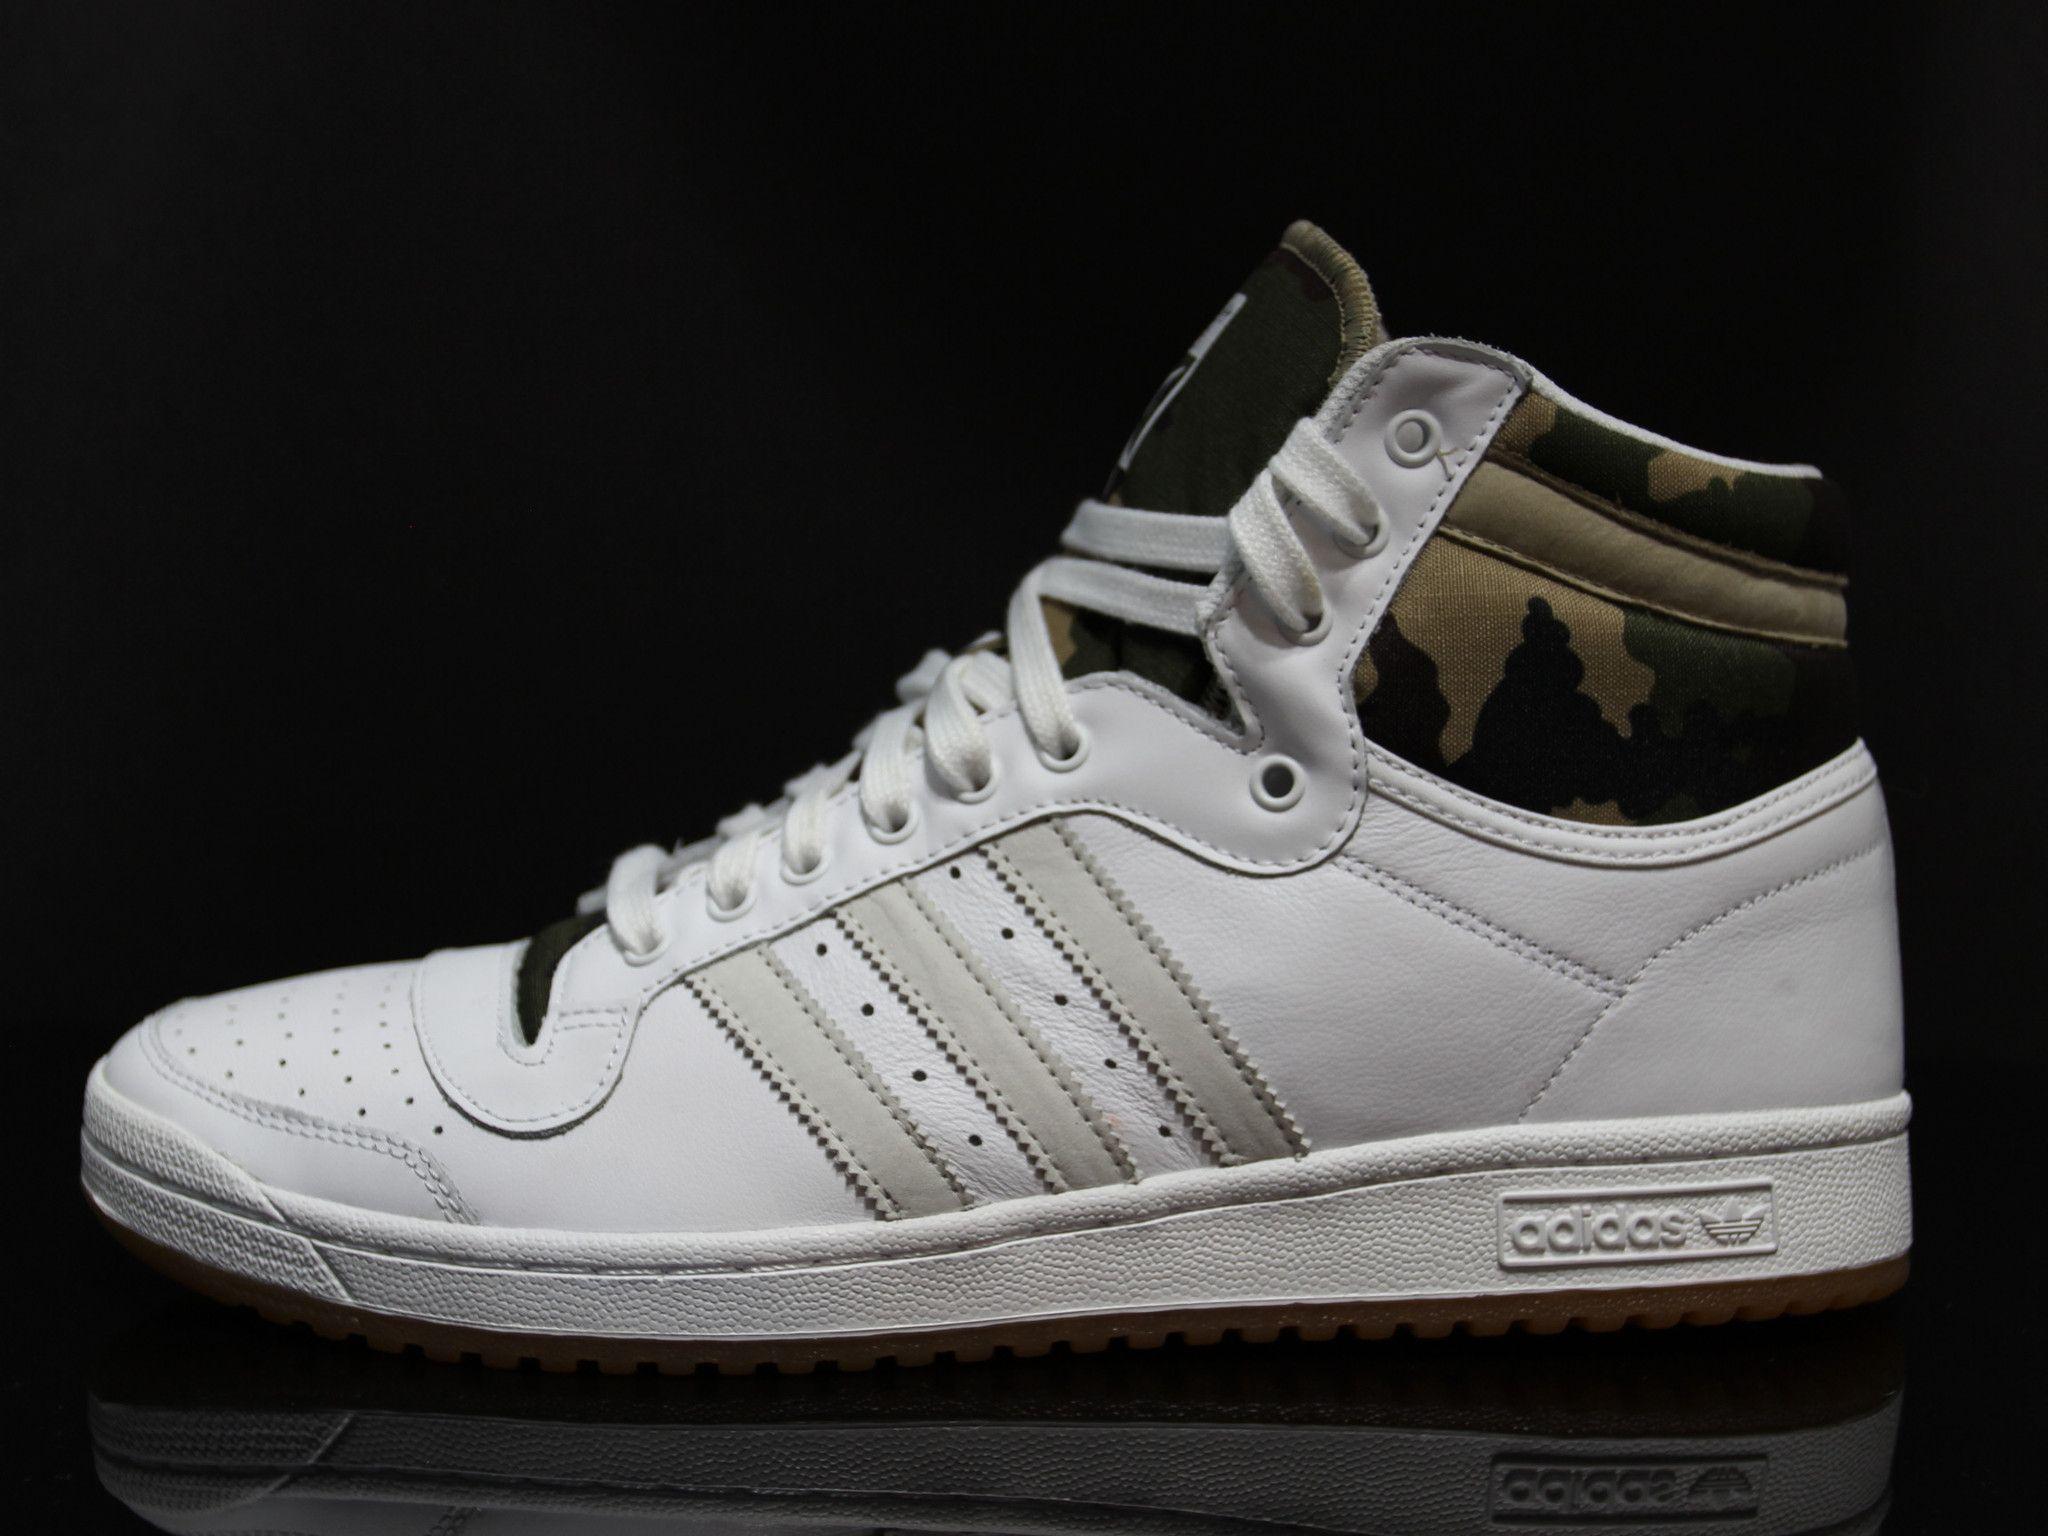 Adidas Originals Top Ten Hi White Leather Hemp Camo Sneakers